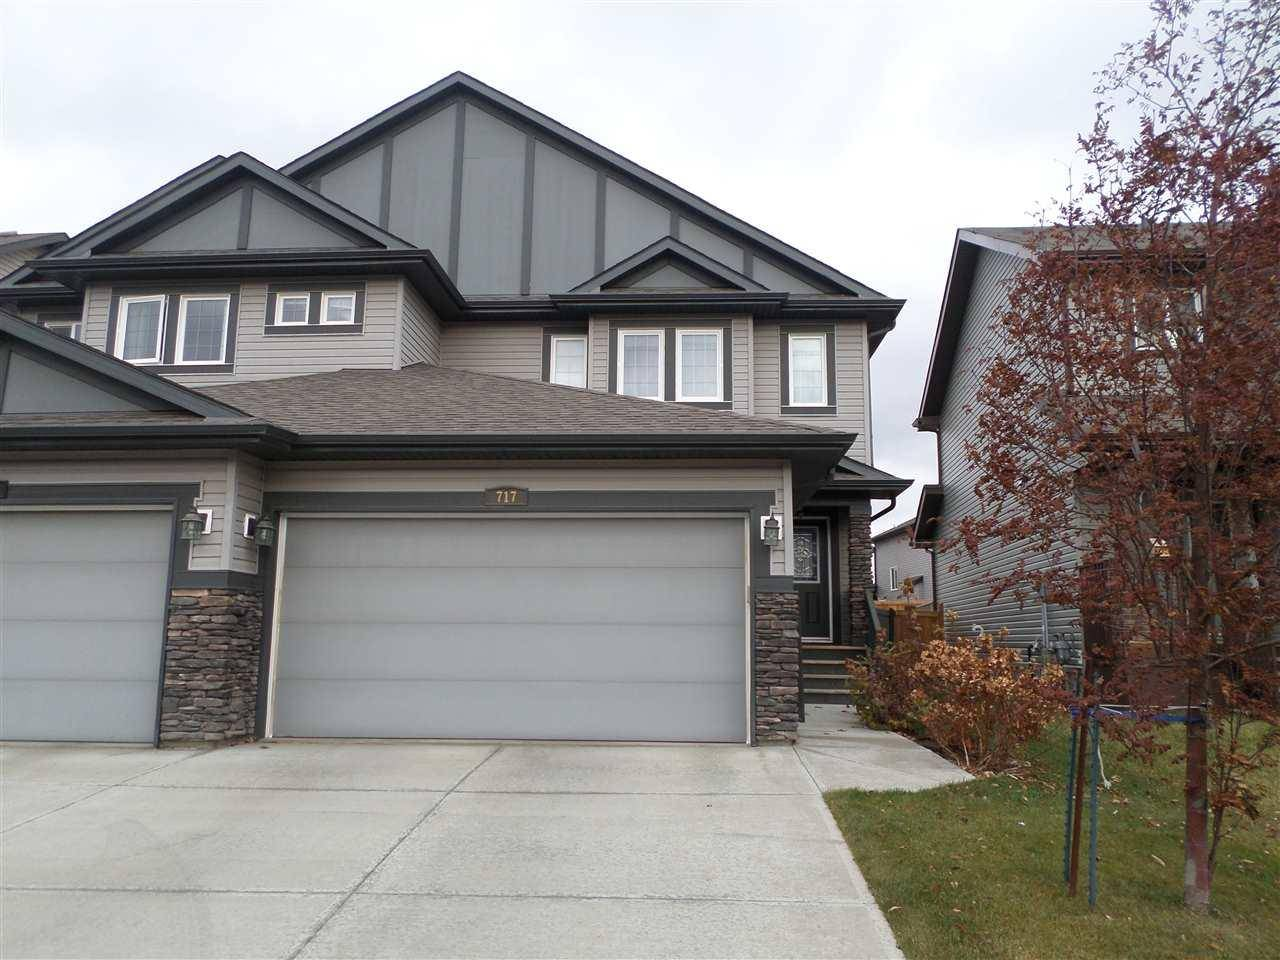 Townhouse for sale at 717 176 St Sw Edmonton Alberta - MLS: E4178953